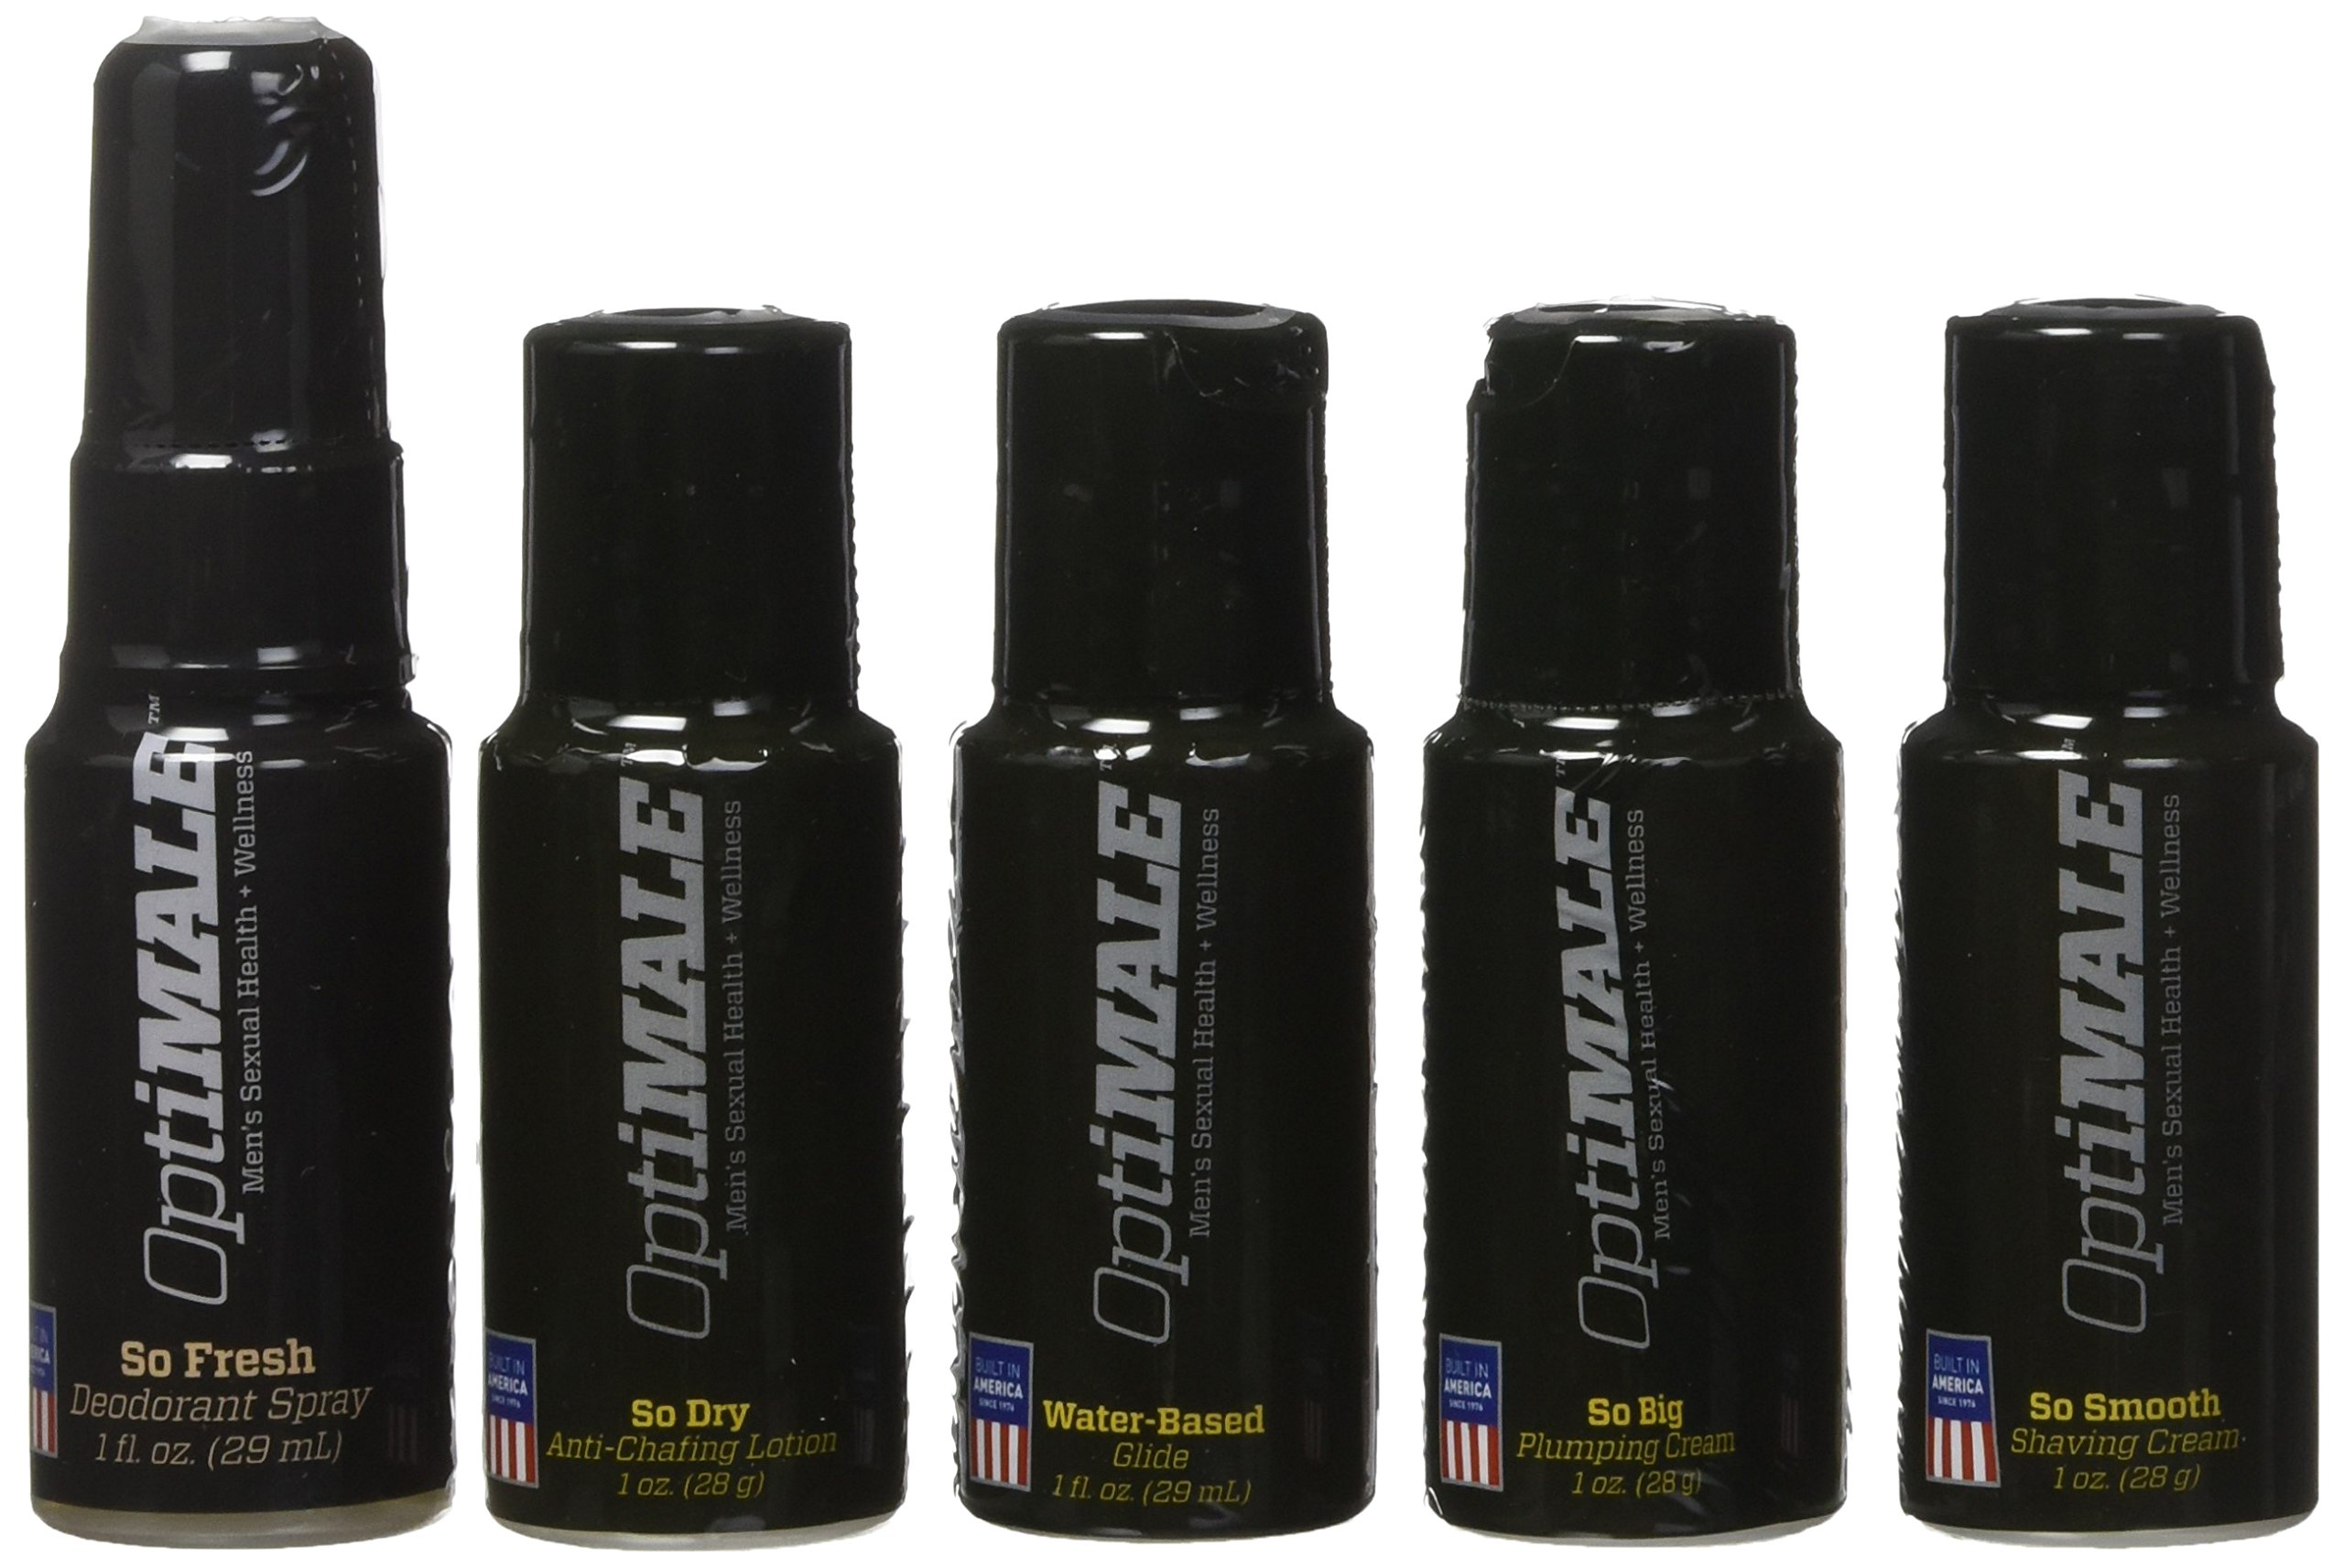 Doc Johnson OptiMALE - Travel Essentials Kit for Men - 1 oz. Bottles of Water-Based Glide, So Dry, So Fresh, So Big, So Smooth by Doc Johnson